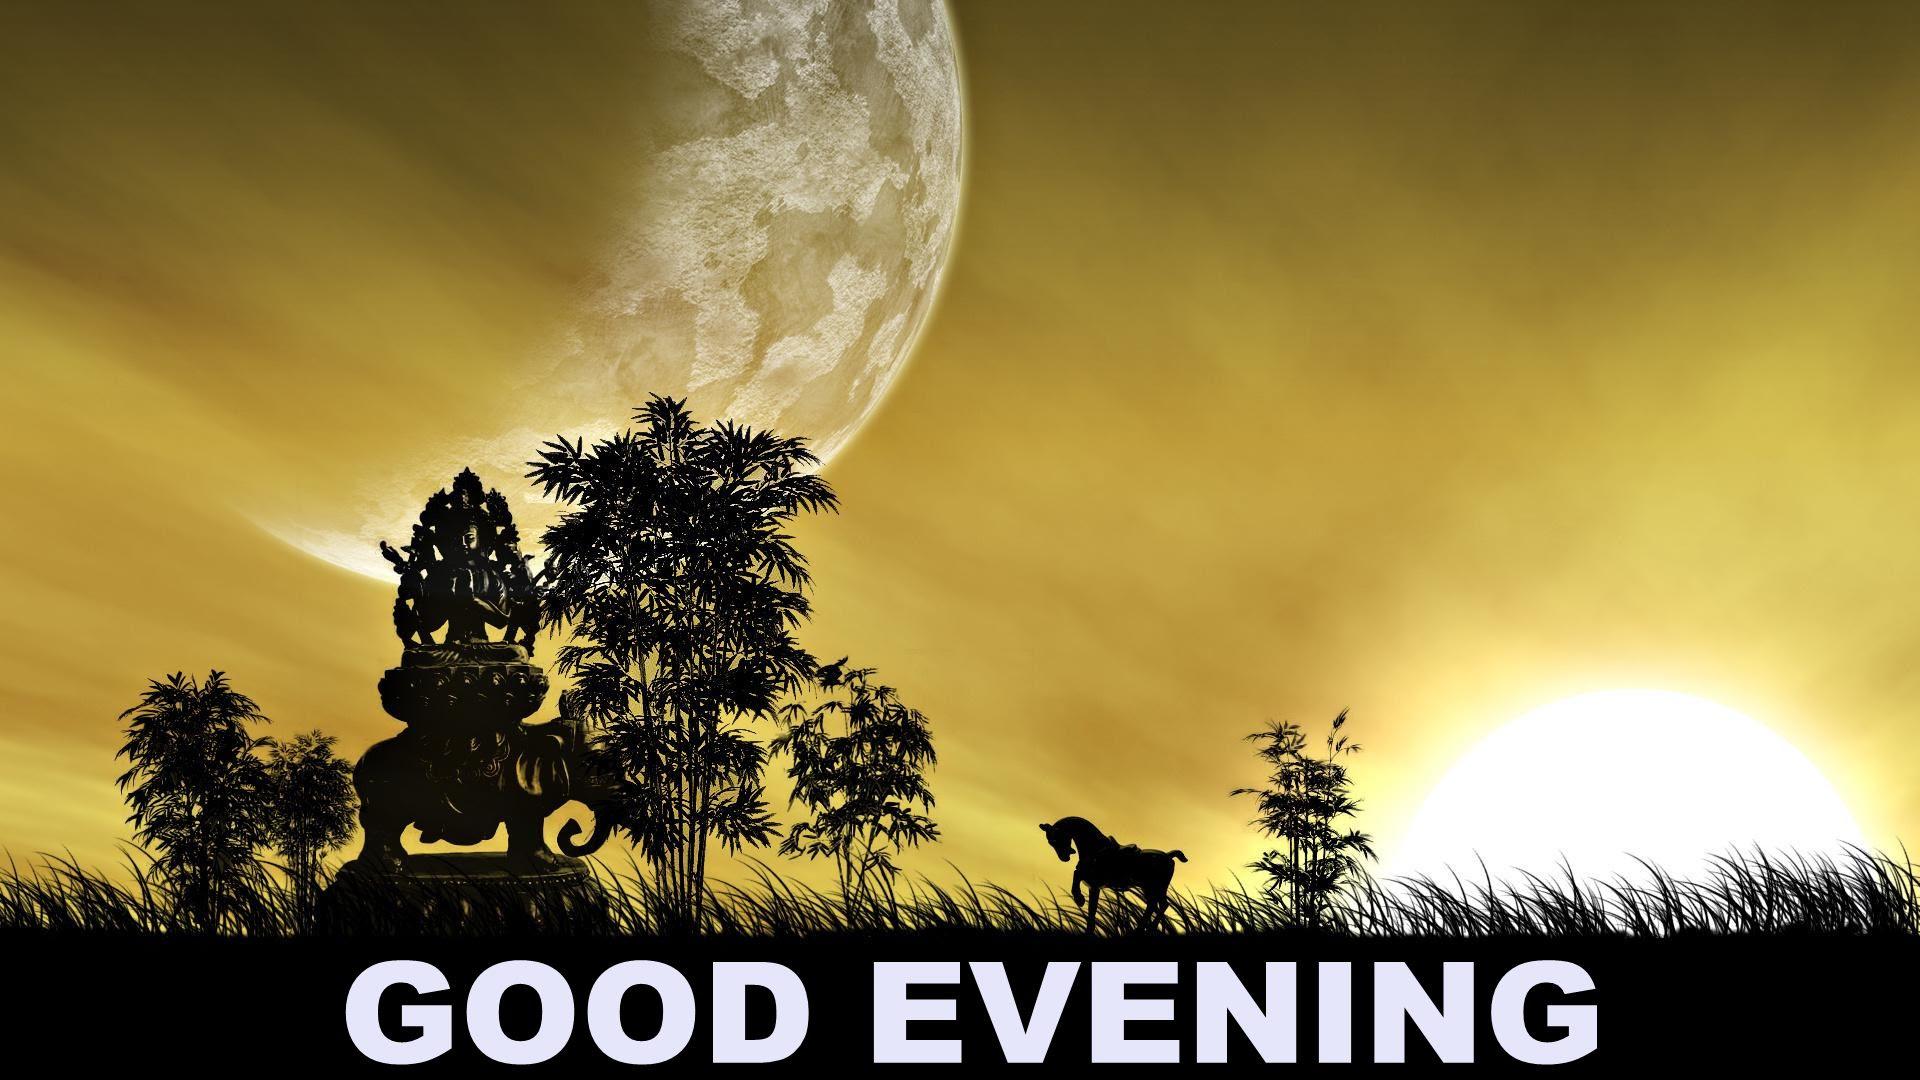 Good Evening Hd Wallpaper 00095 Wallpaperspickcom